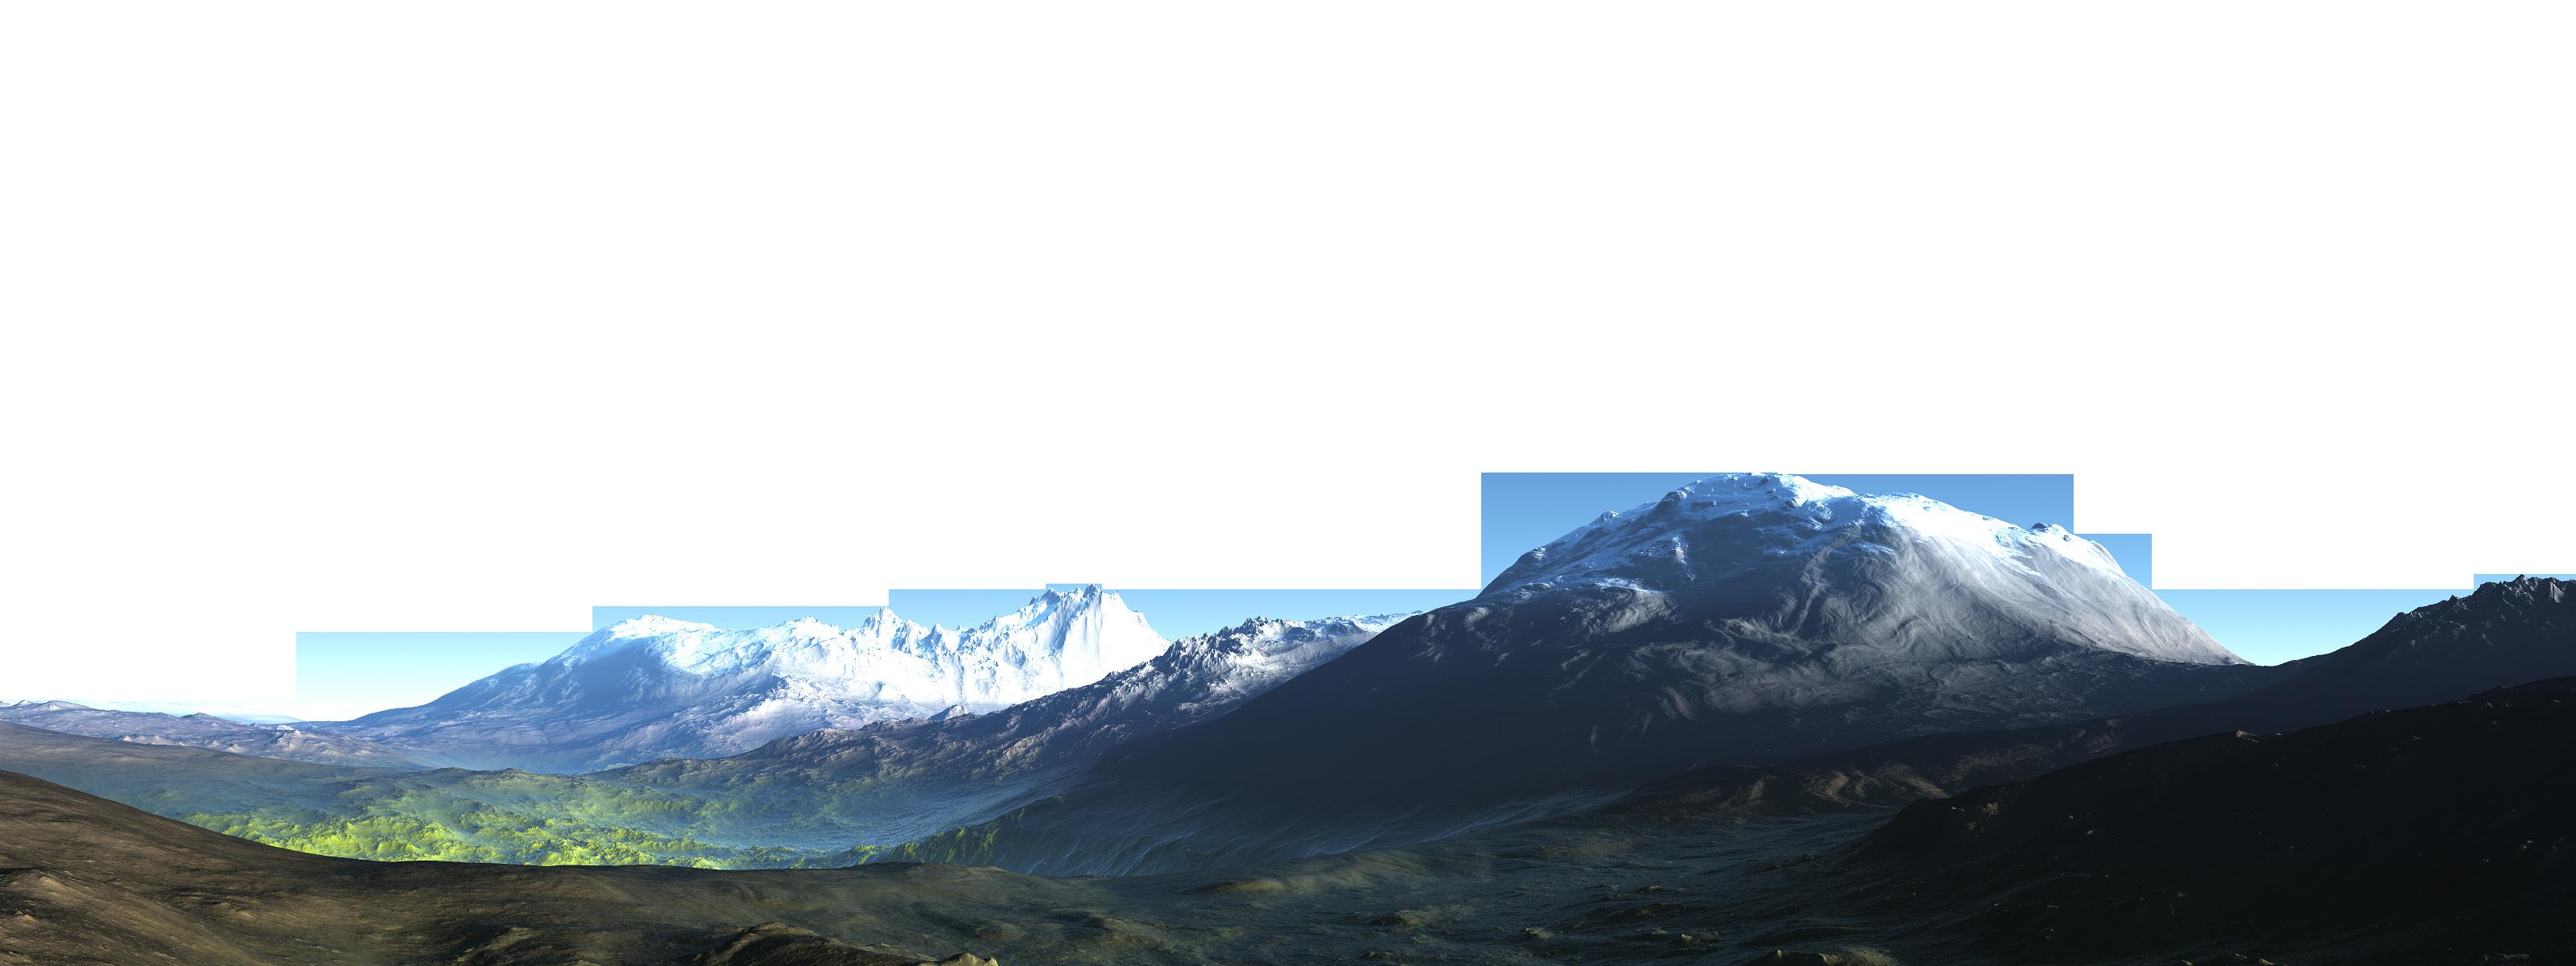 Mountain Png File PNG Image - Mountain PNG - Mountain Peak PNG HD